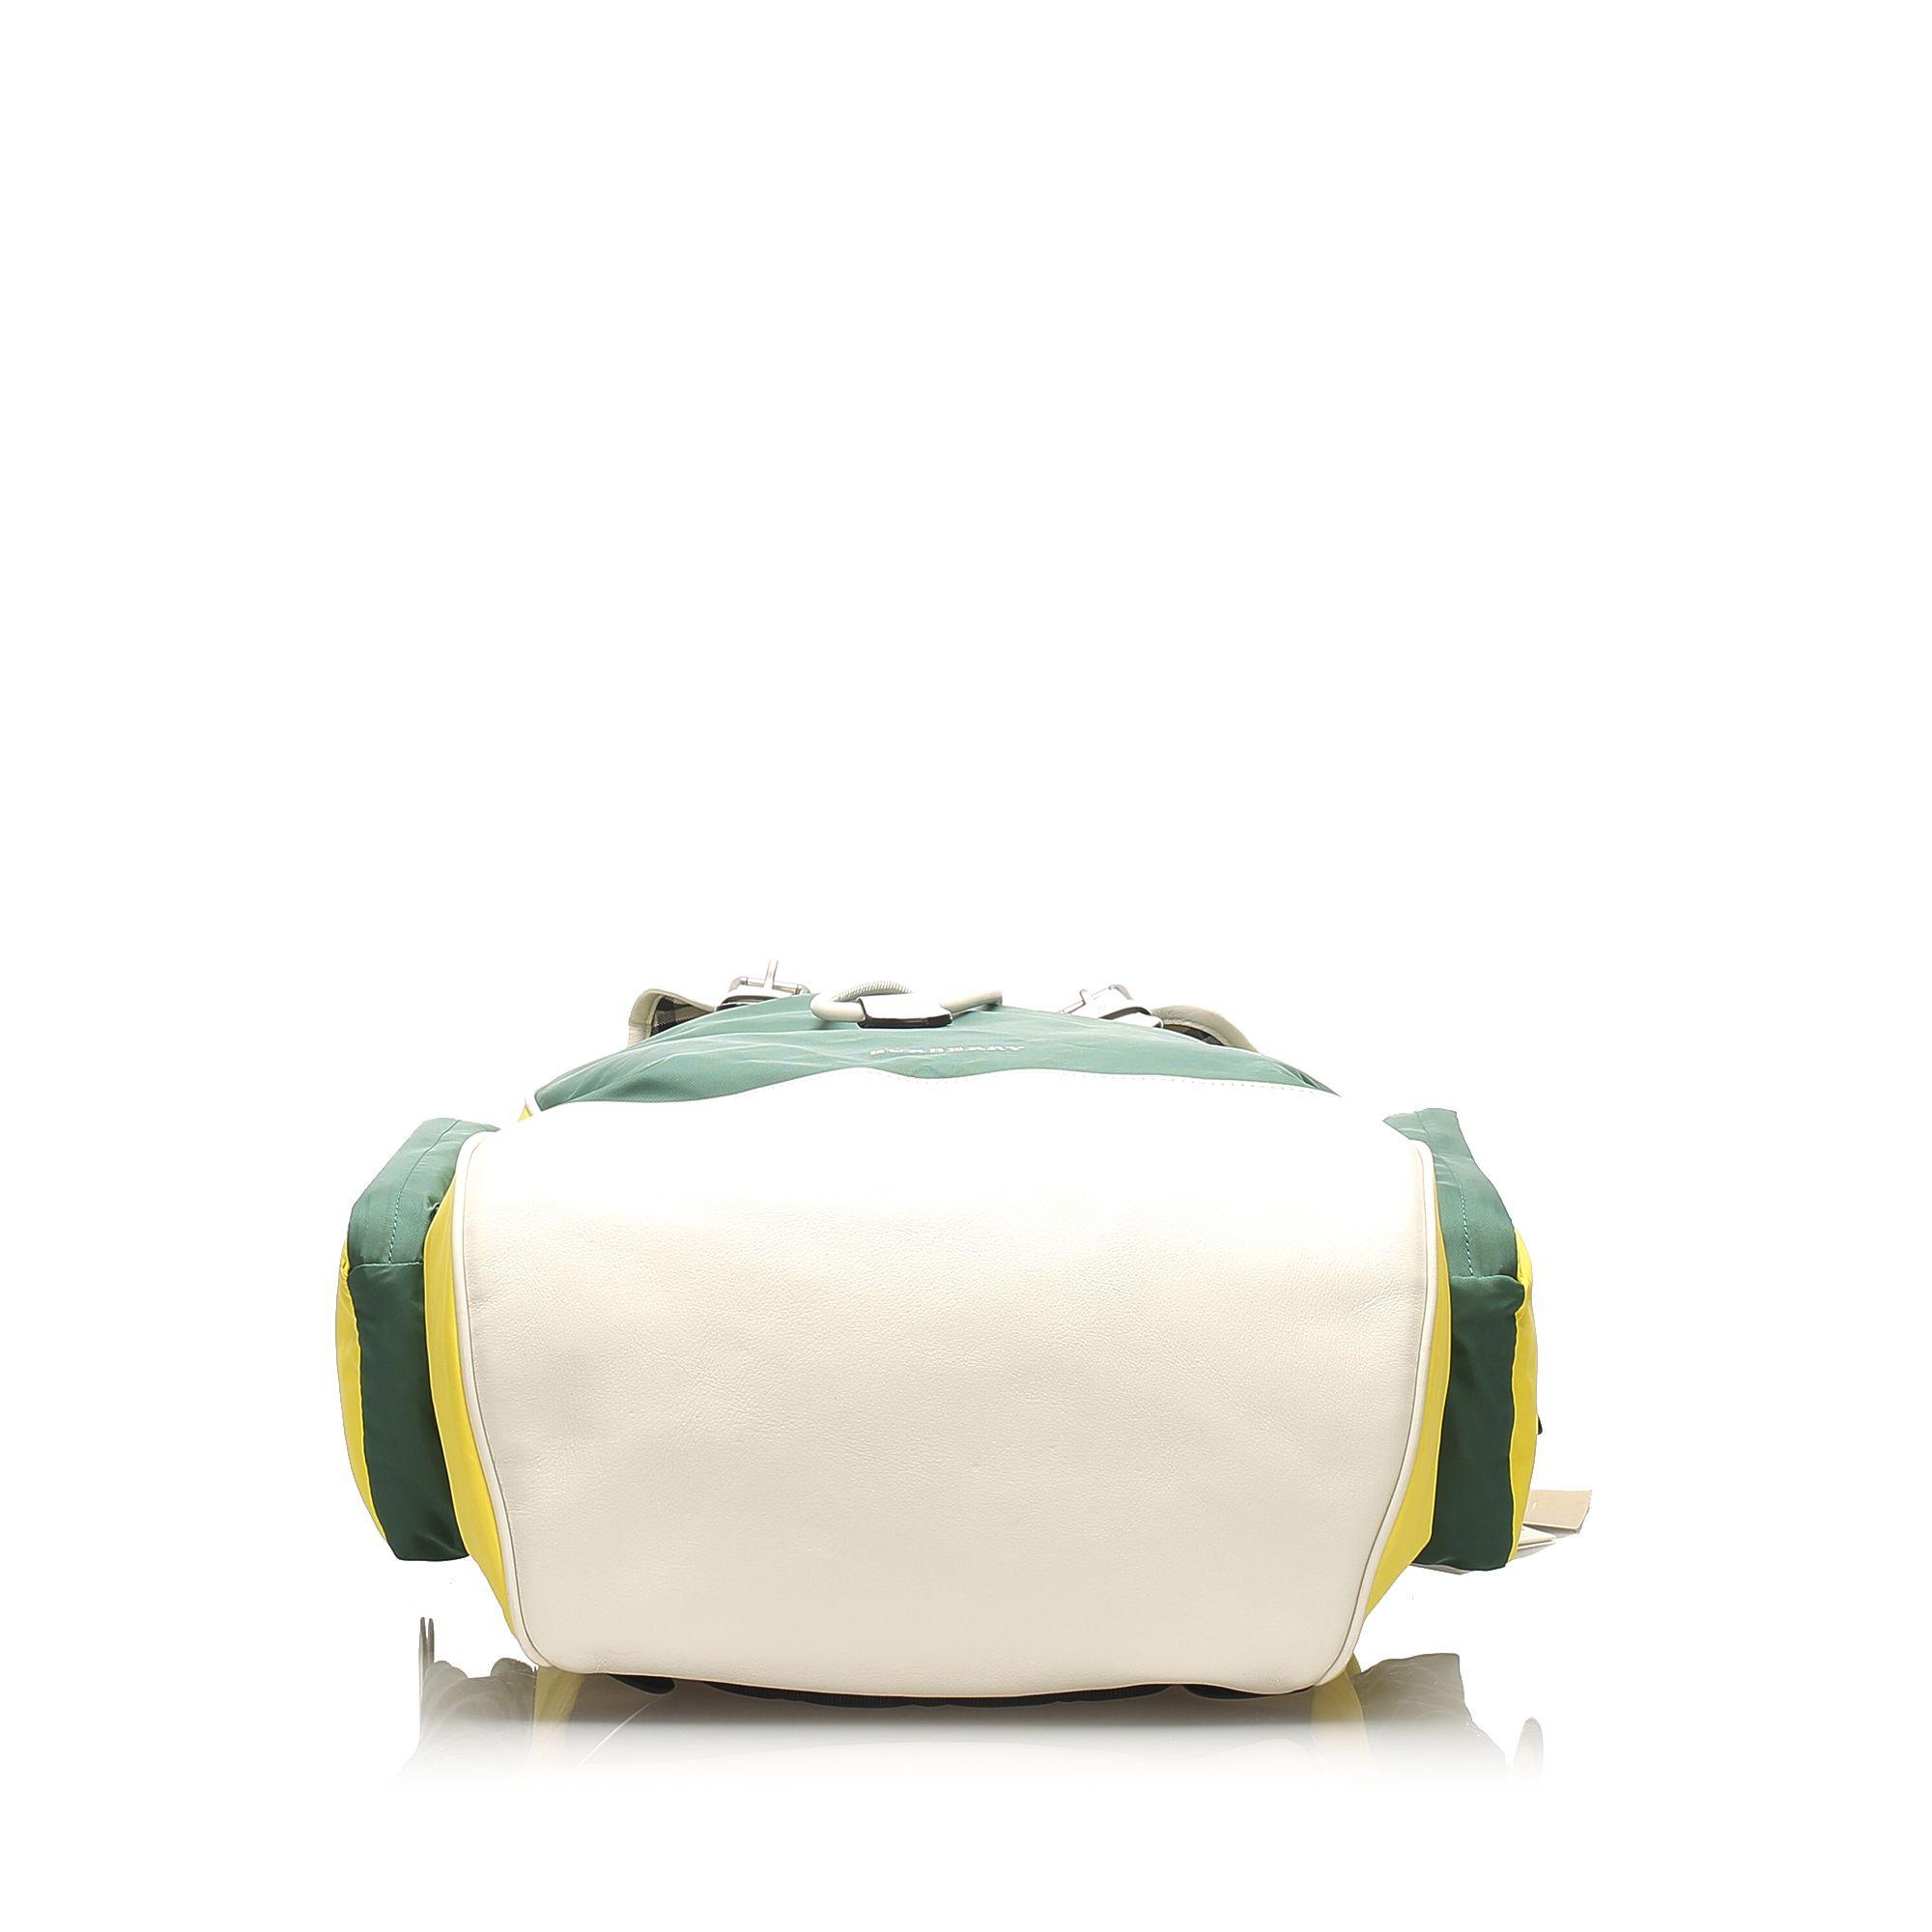 Vintage Burberry Nylon Backpack Green